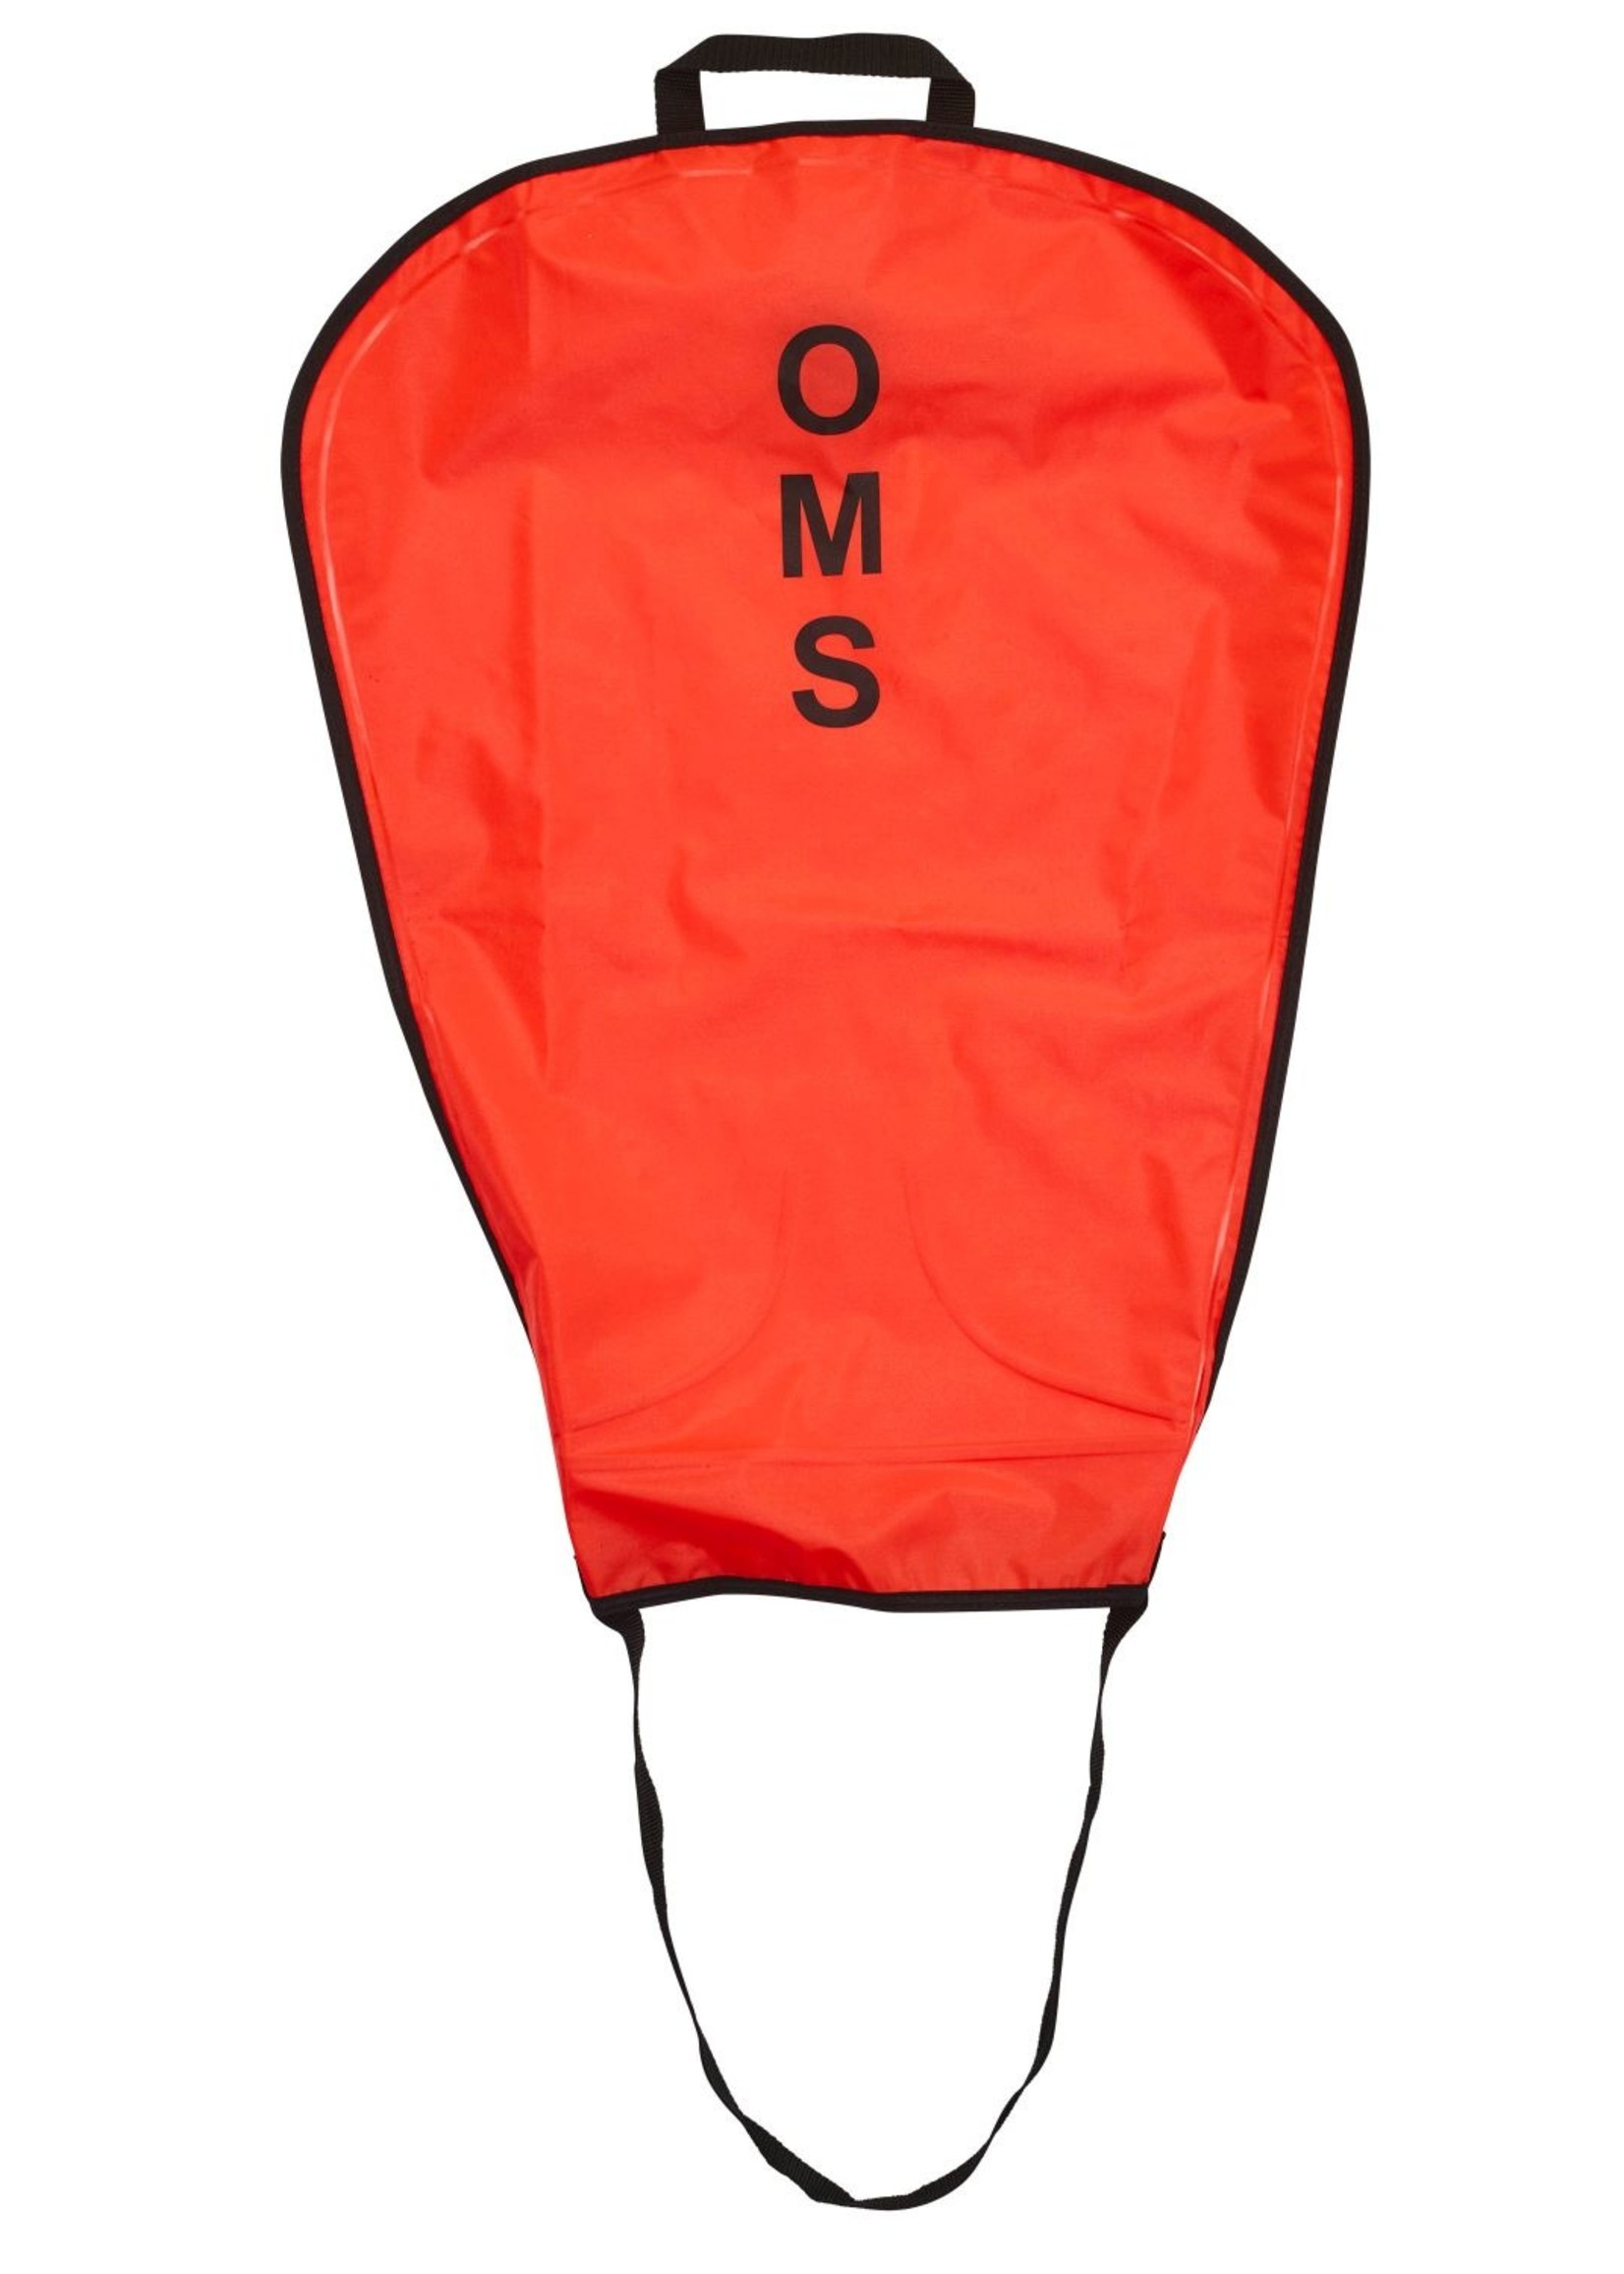 OMS OMS Liftbag 50 lbs